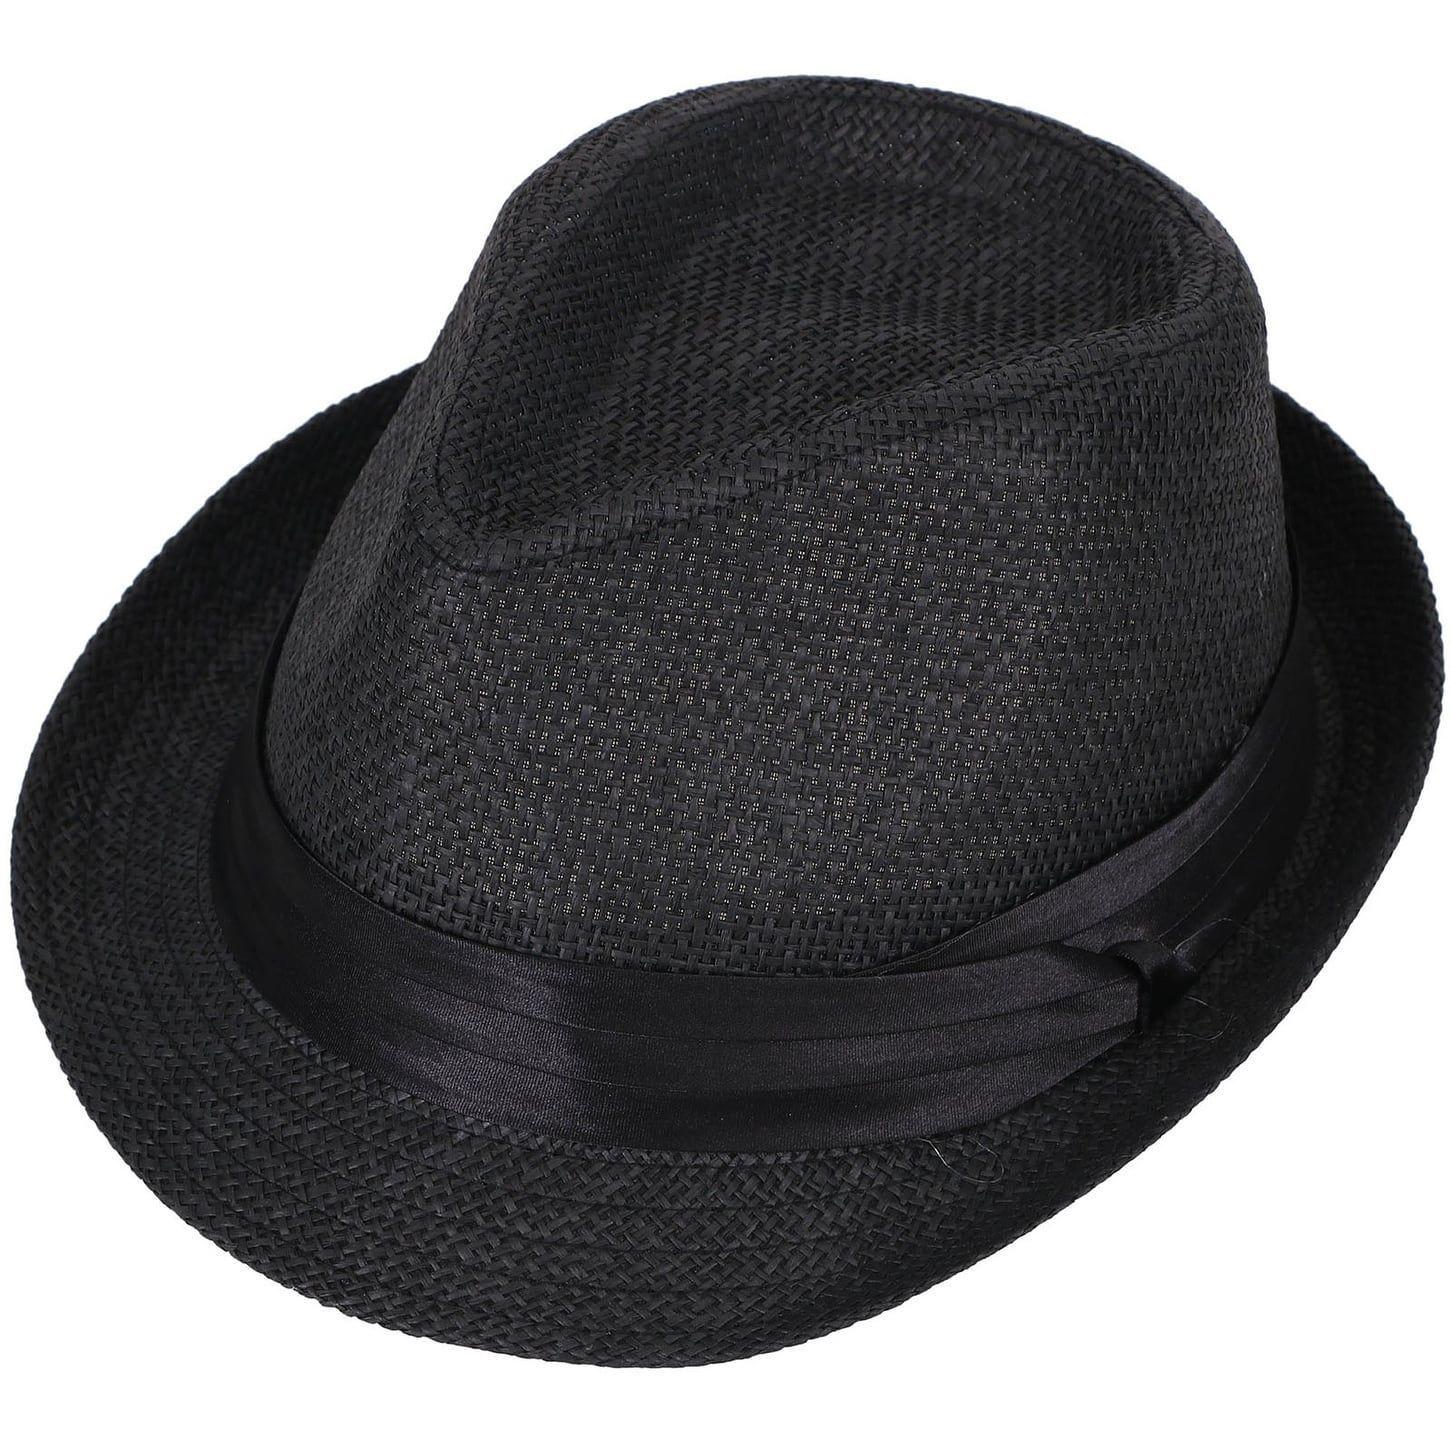 bcc258f60497f Simplicity Women Men Summer Double Colors Fedora Hat w  Rasta Band ...